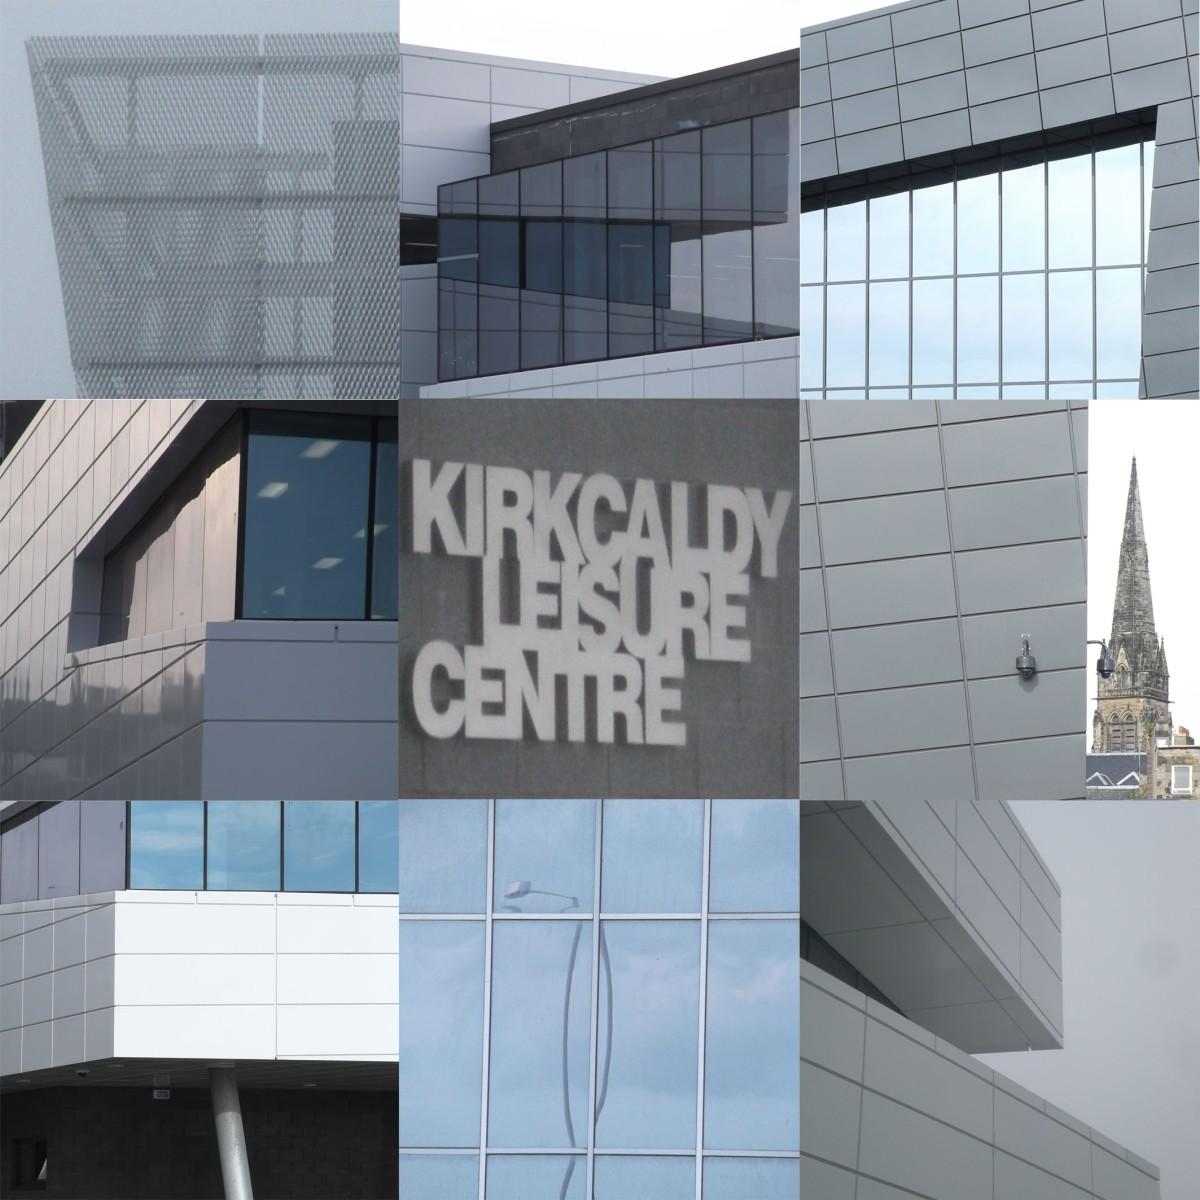 6 new kirkcaldy leisure centre 3 x 3 grid  18cm x 18cm